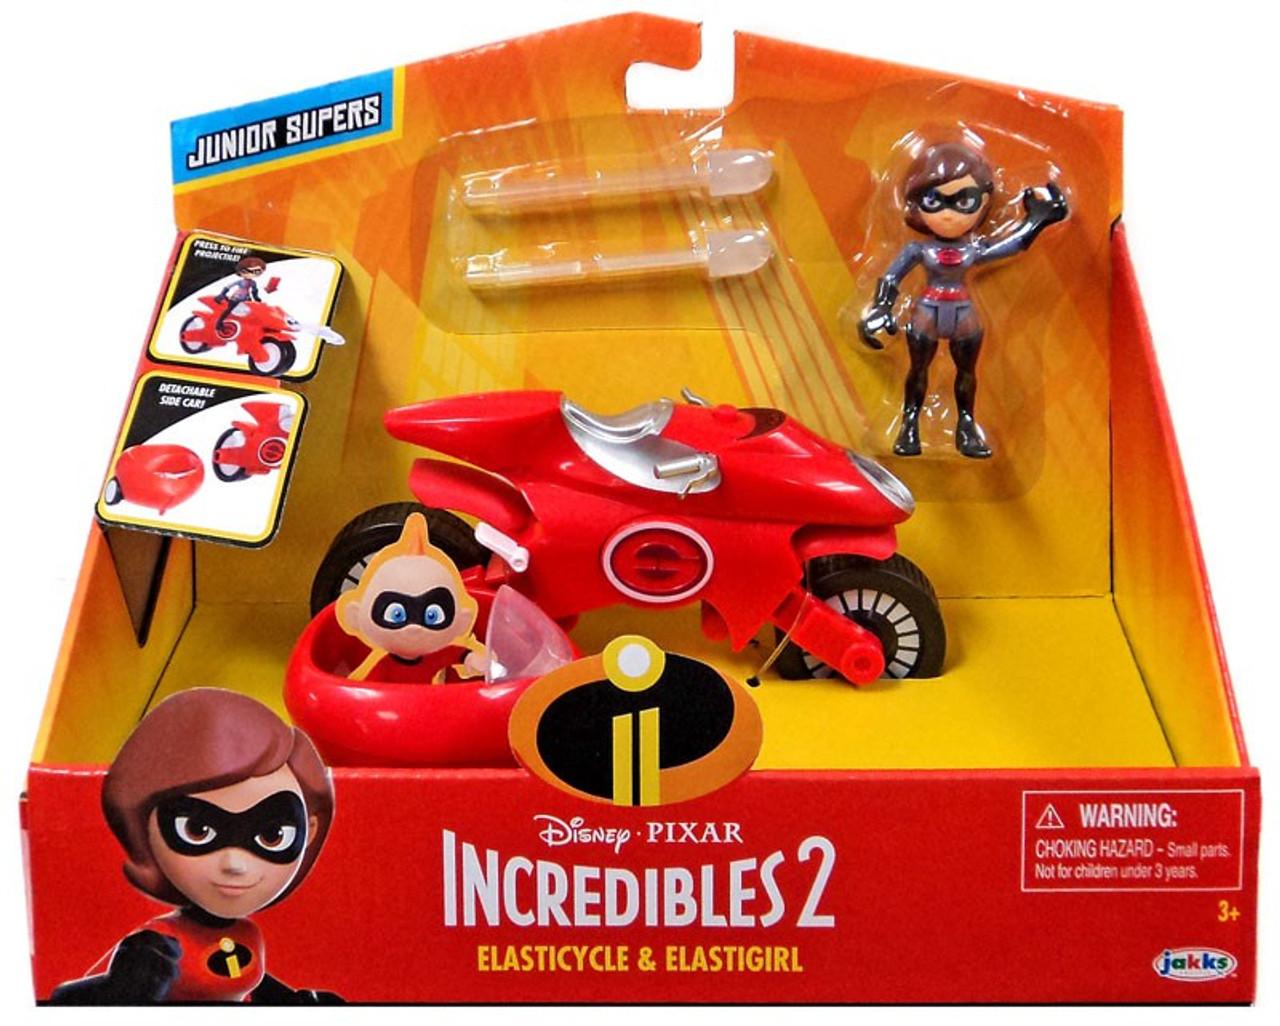 ac7c70a9c7c Disney Pixar Incredibles 2 Junior Supers Elasticycle Elastigirl 3 Vehicle  Jakks Pacific - ToyWiz